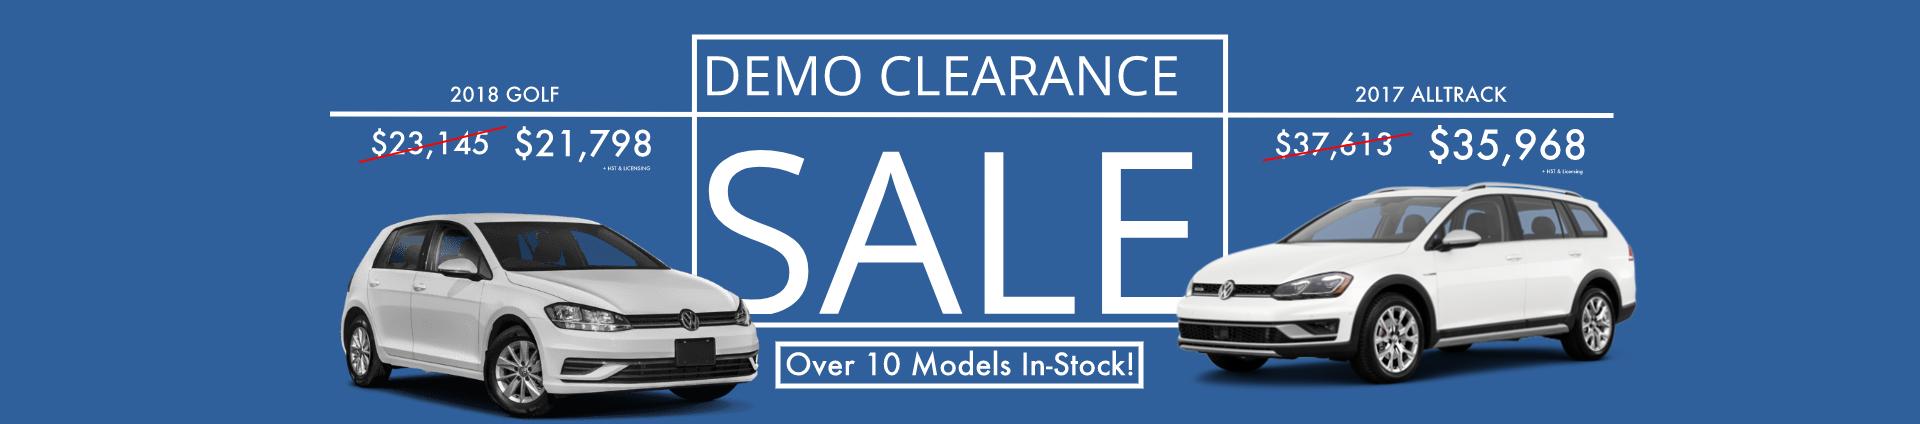 Demo Clearance Sale